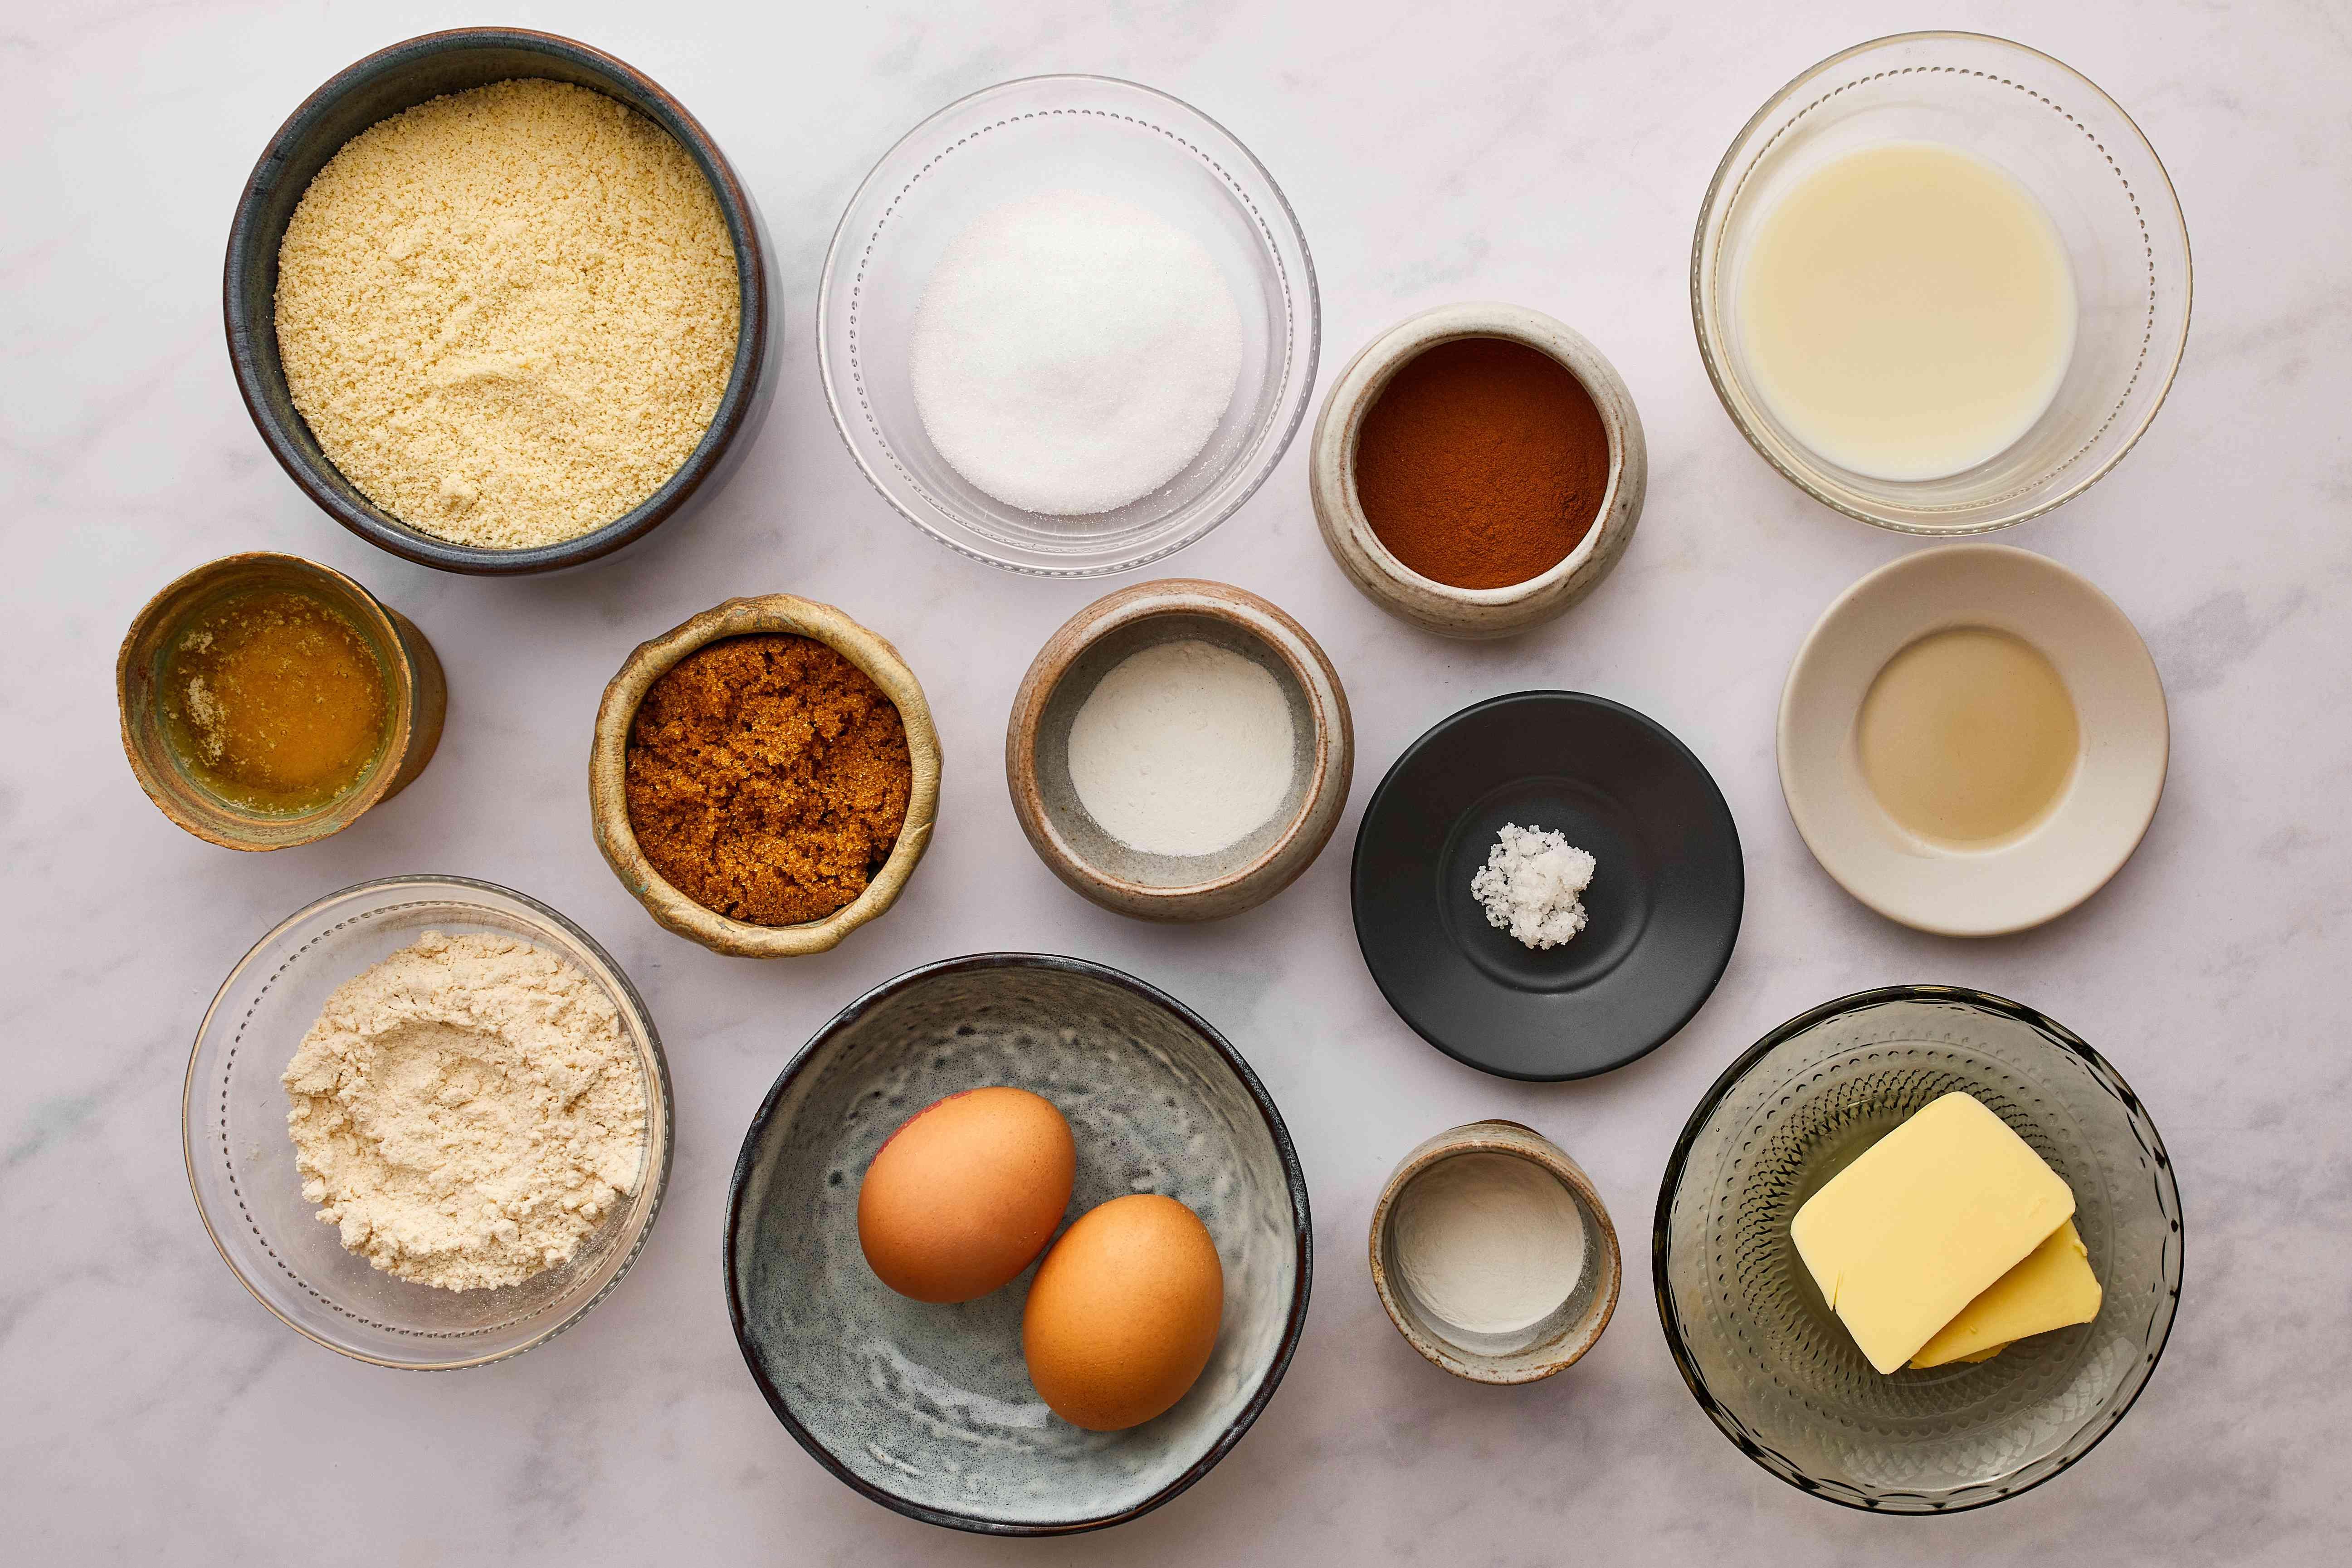 keto cinnamon roll ingredients gathered